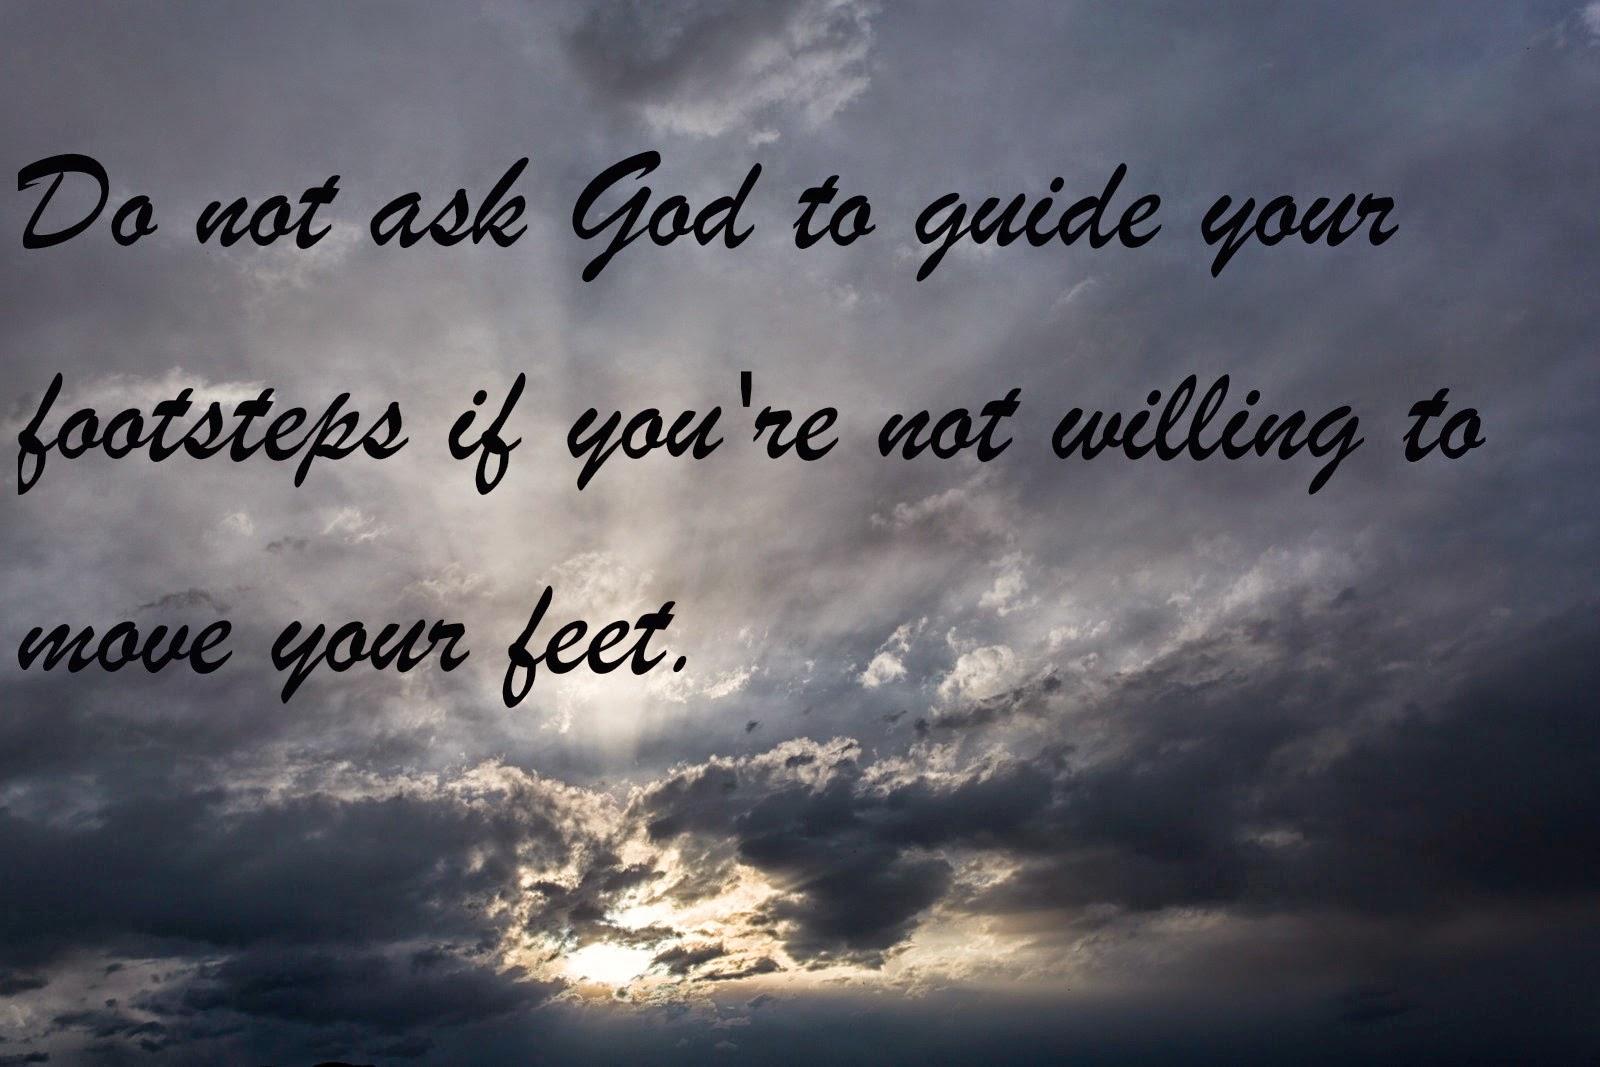 Do not Ask God